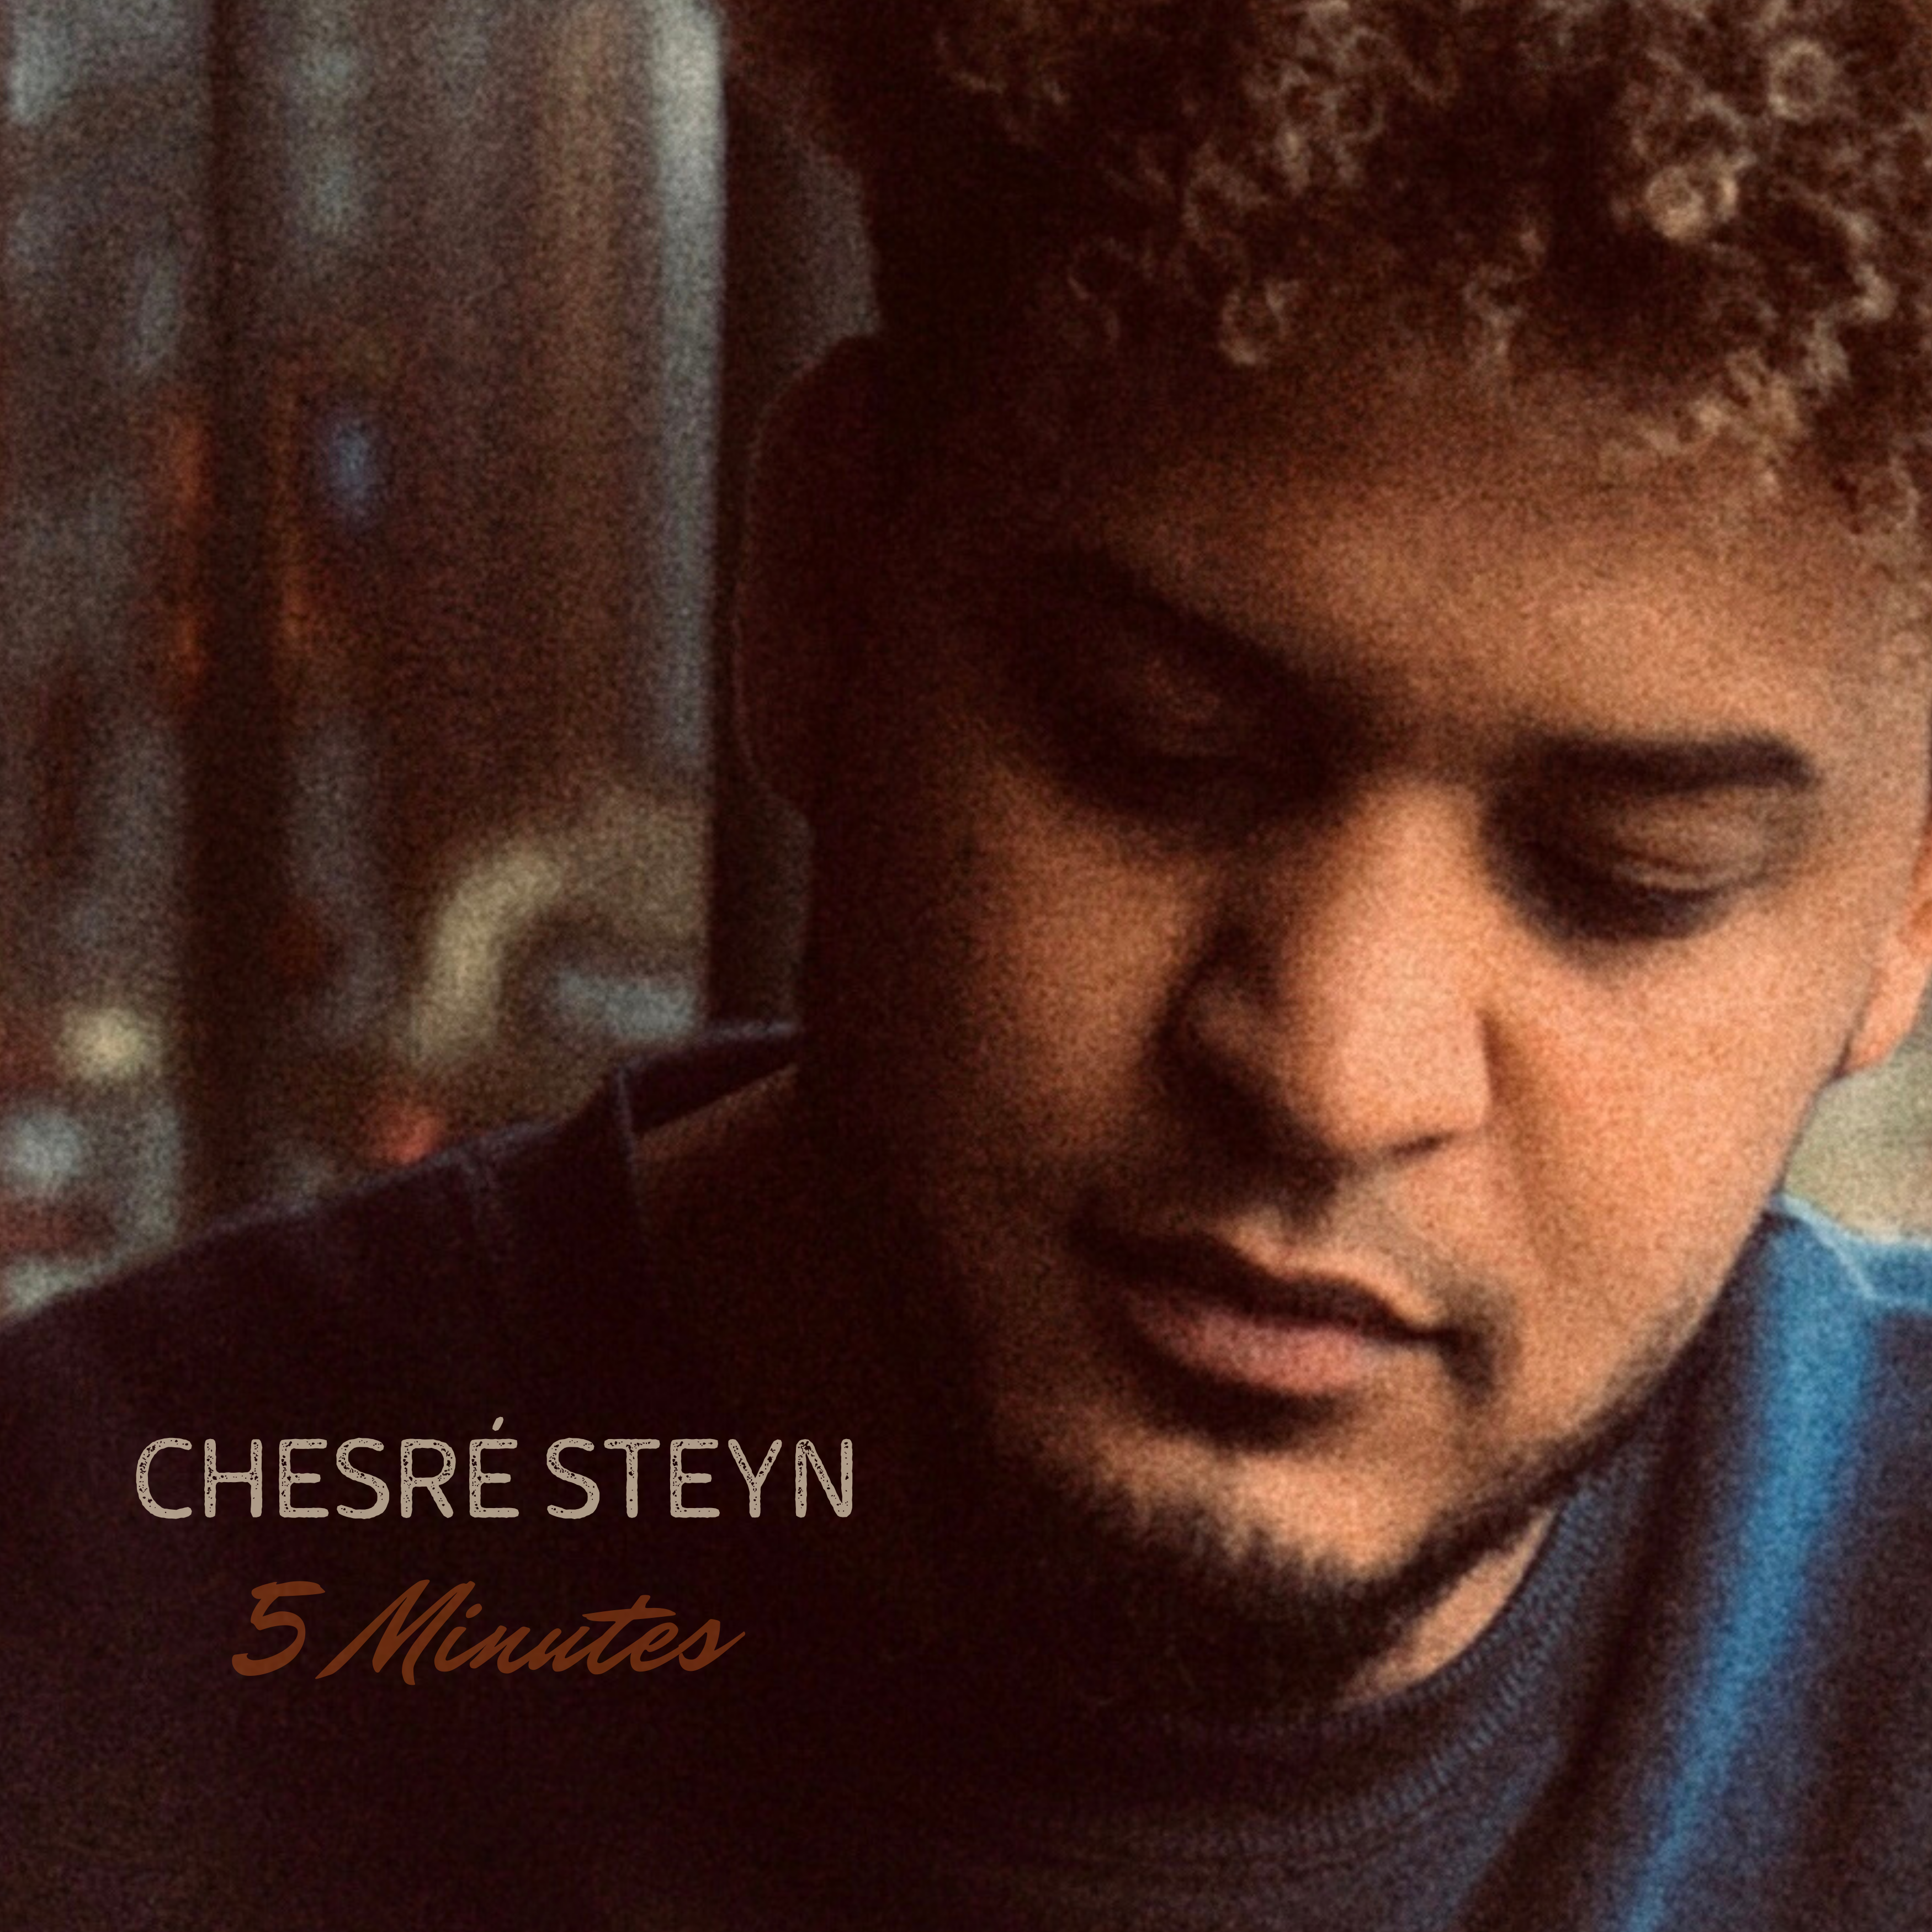 CHESRE STEYN